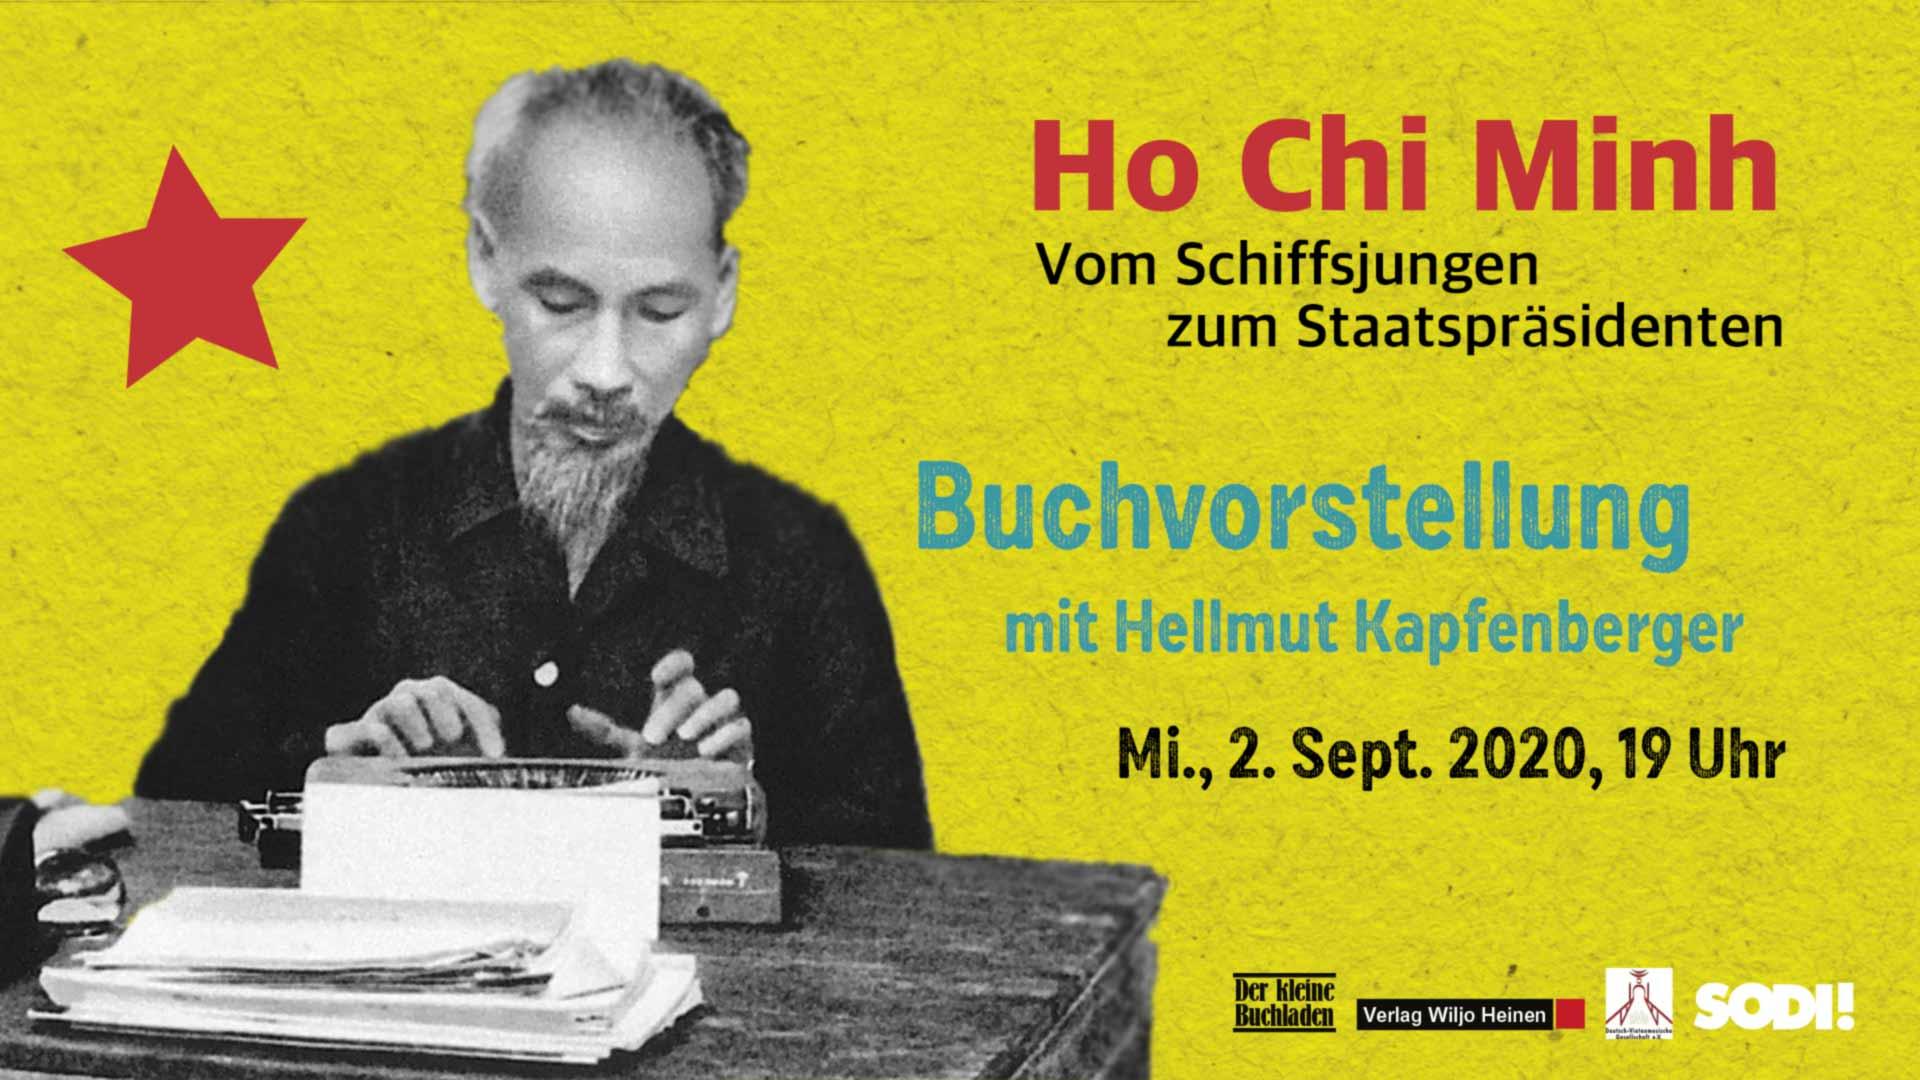 Buchvorstellung »Ho Chi Minh« am 2.9.2020